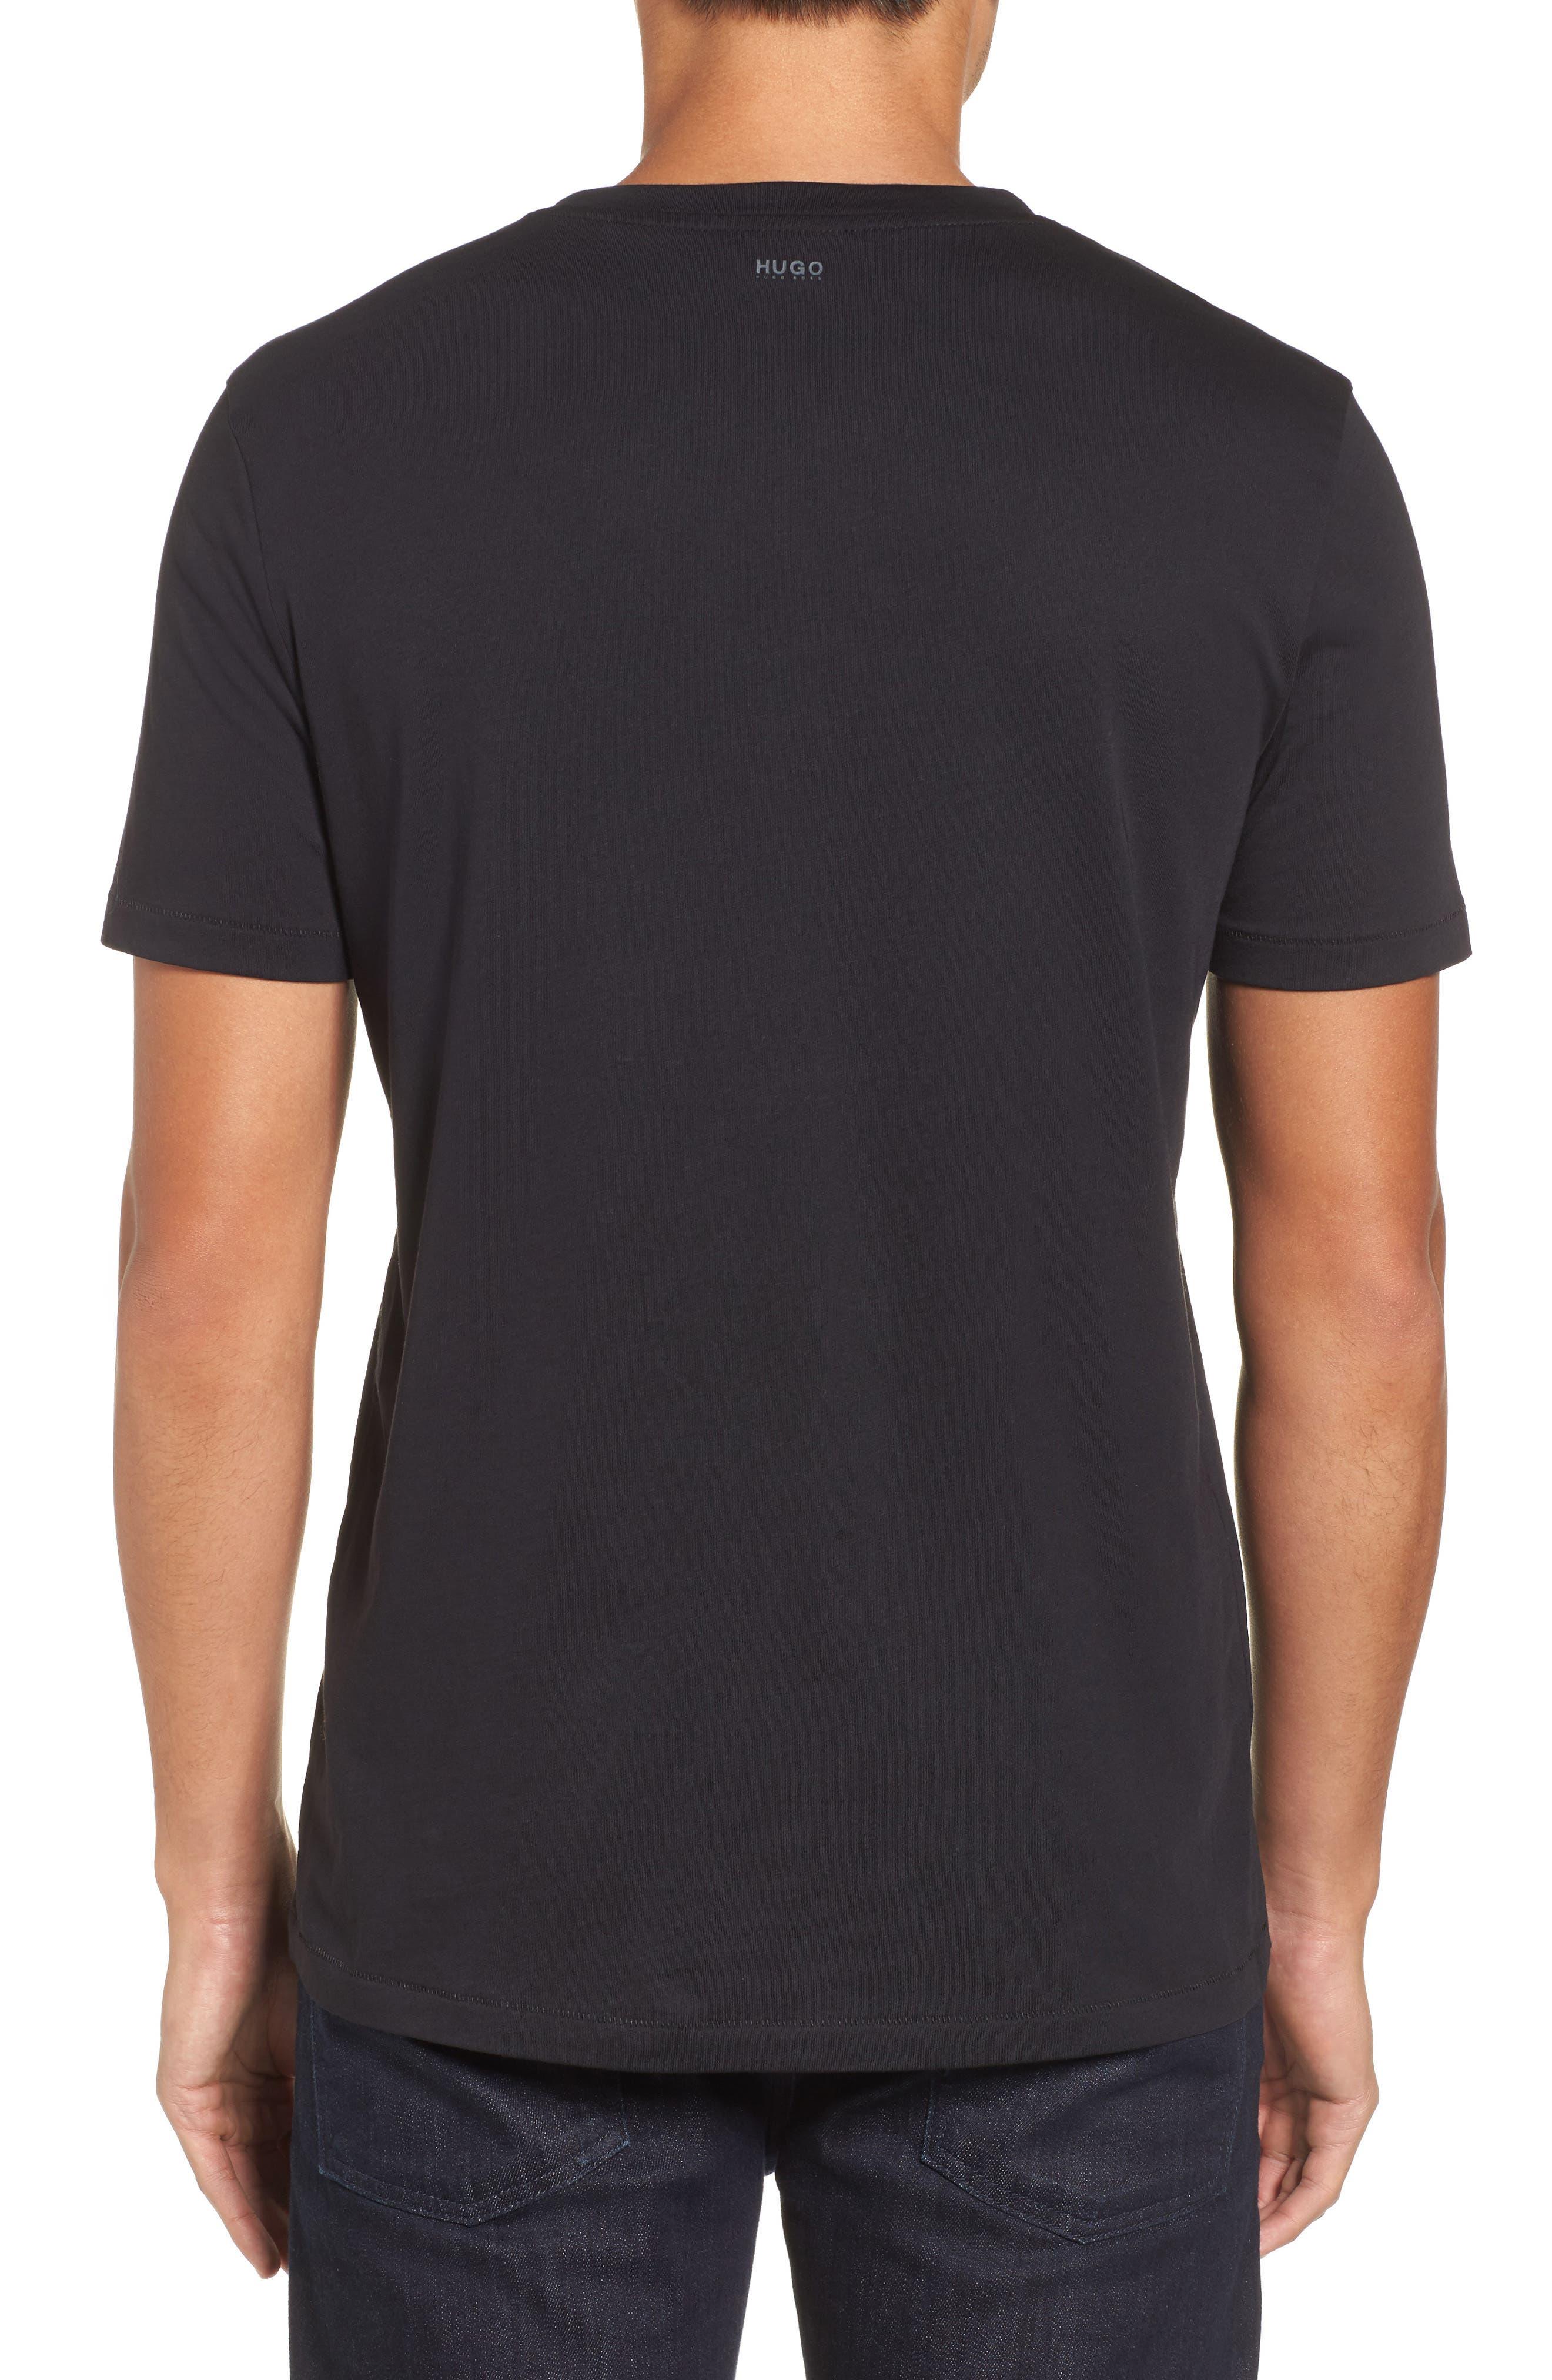 Hugo Boss Drison Hashmark Graphic T-Shirt,                             Alternate thumbnail 2, color,                             001